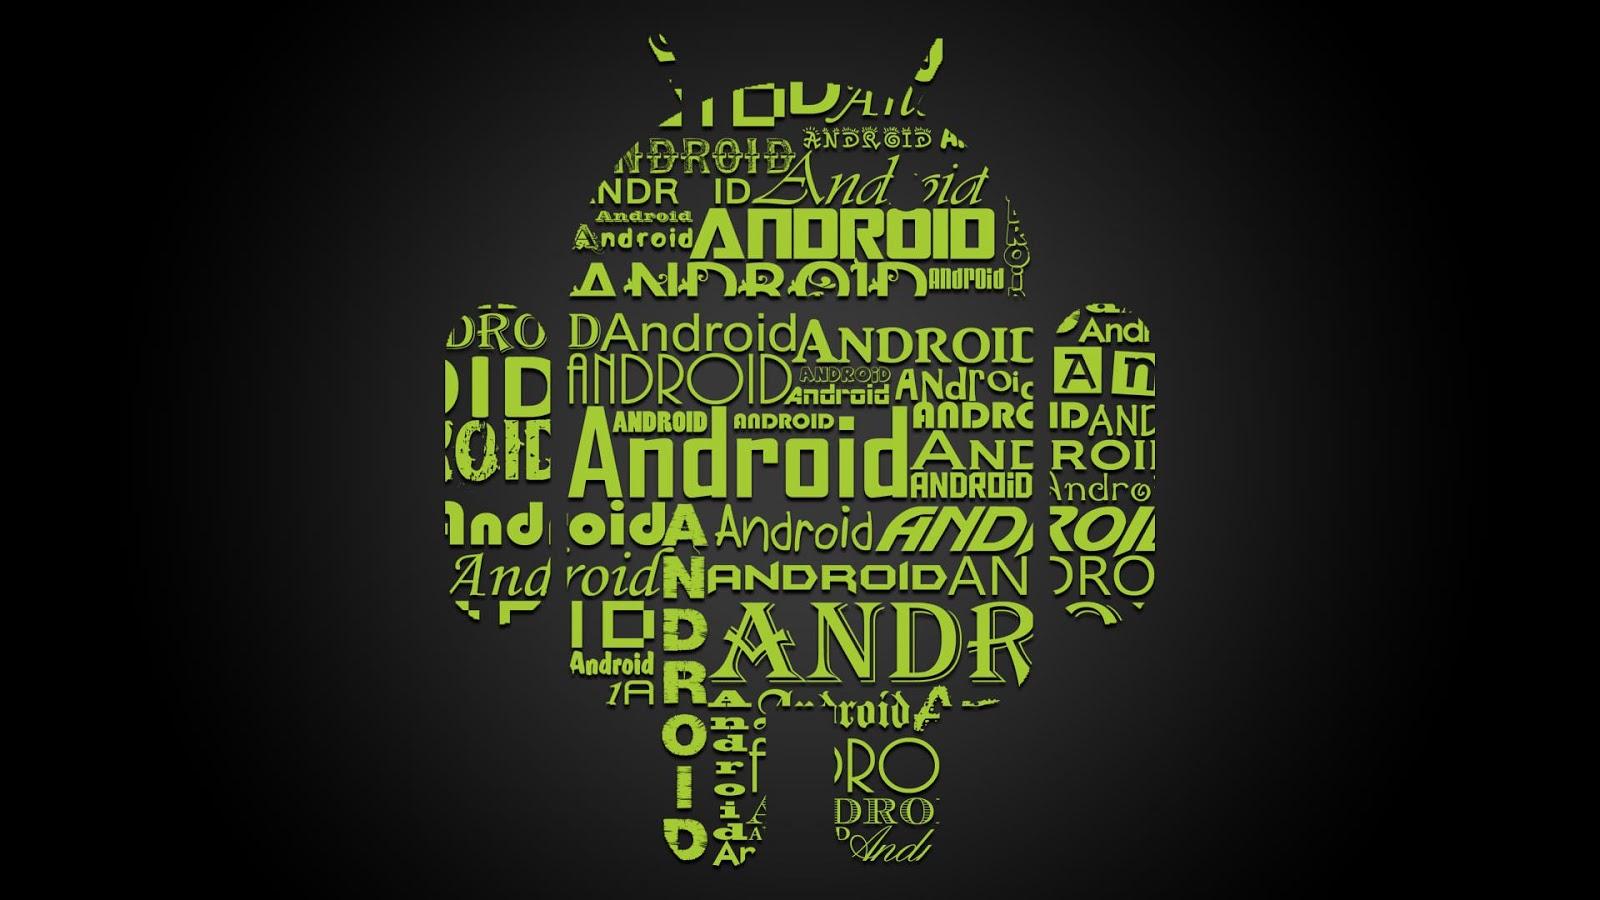 Android Teks Design Logo Black and Green Color